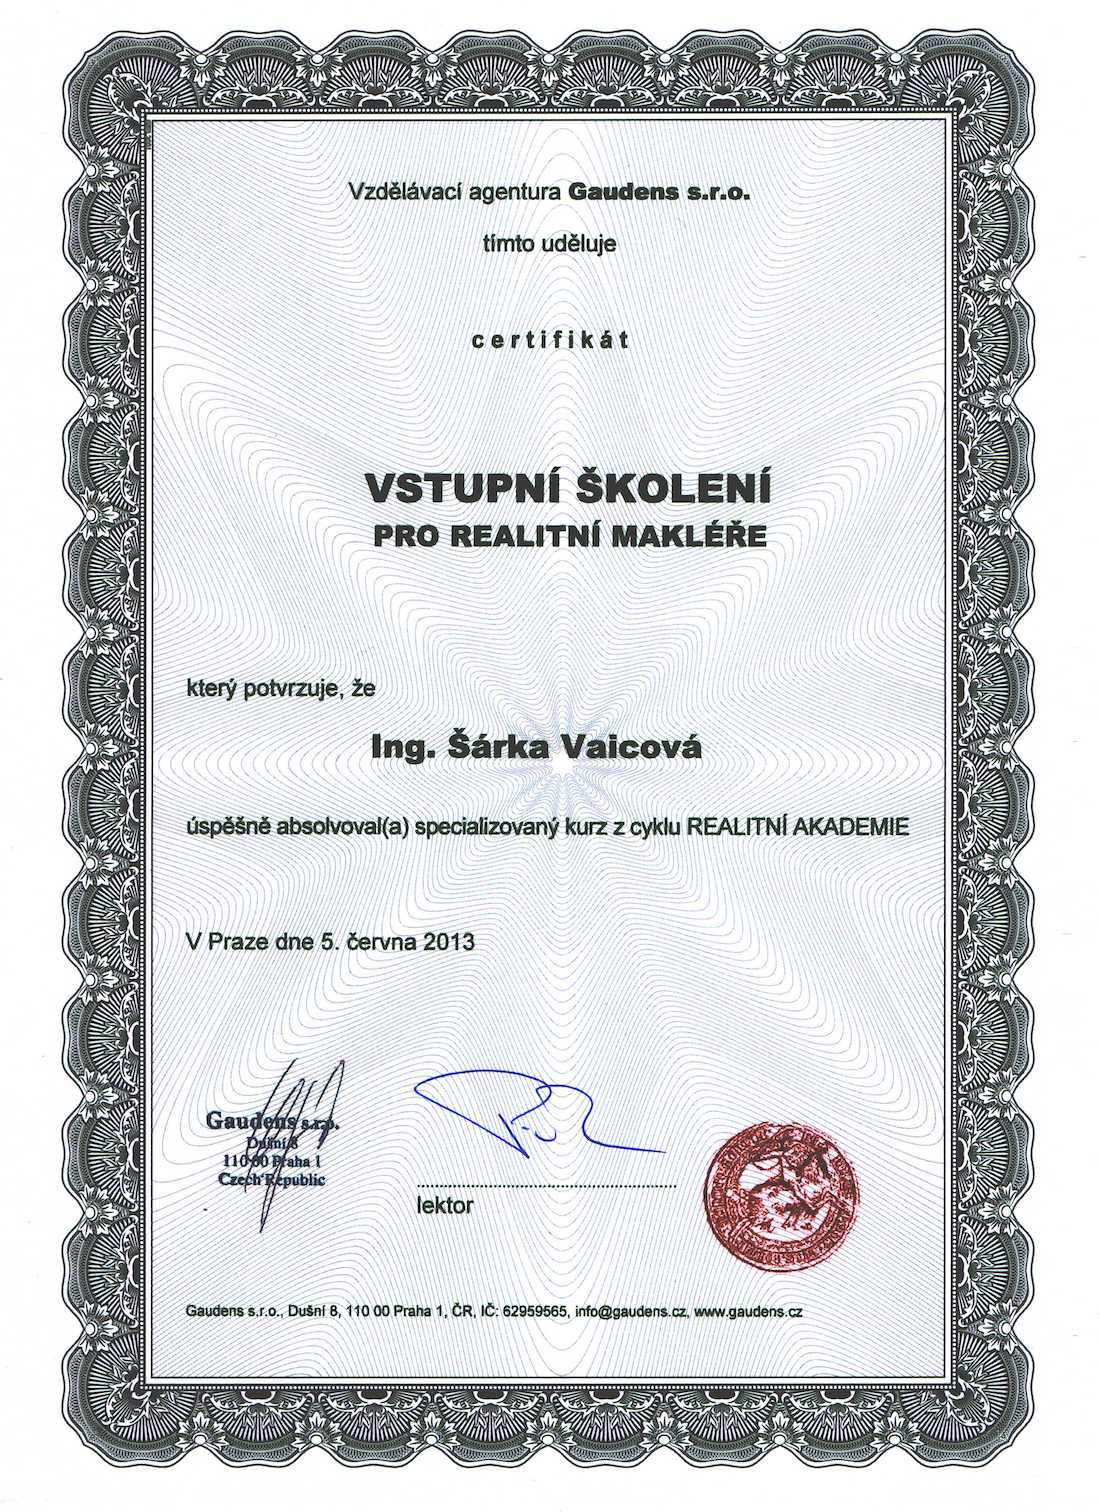 CertifikatII.jpg